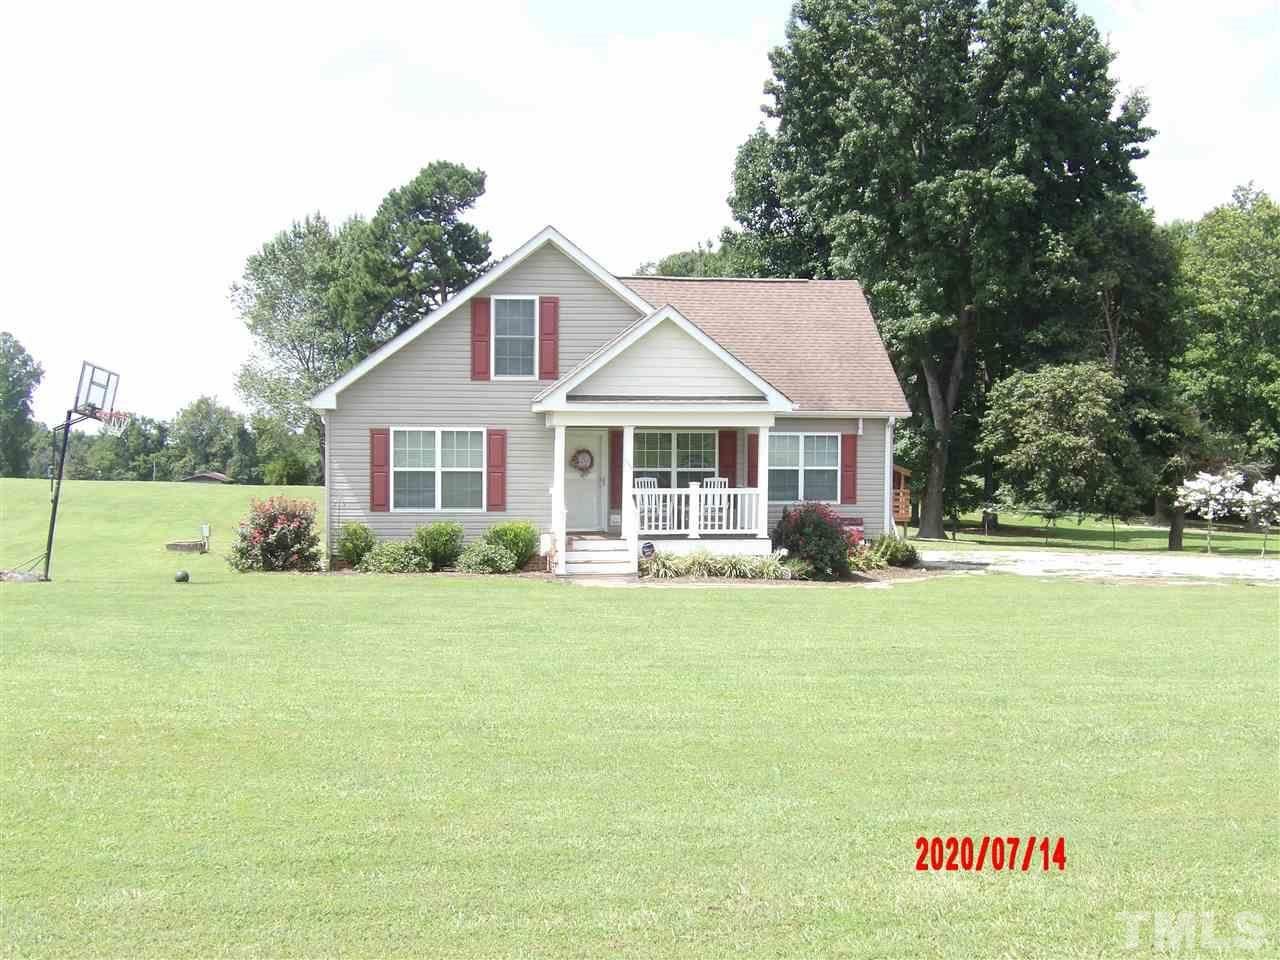 3247 Satterwhite Point Road, Henderson, NC 27537 - MLS#: 2340114